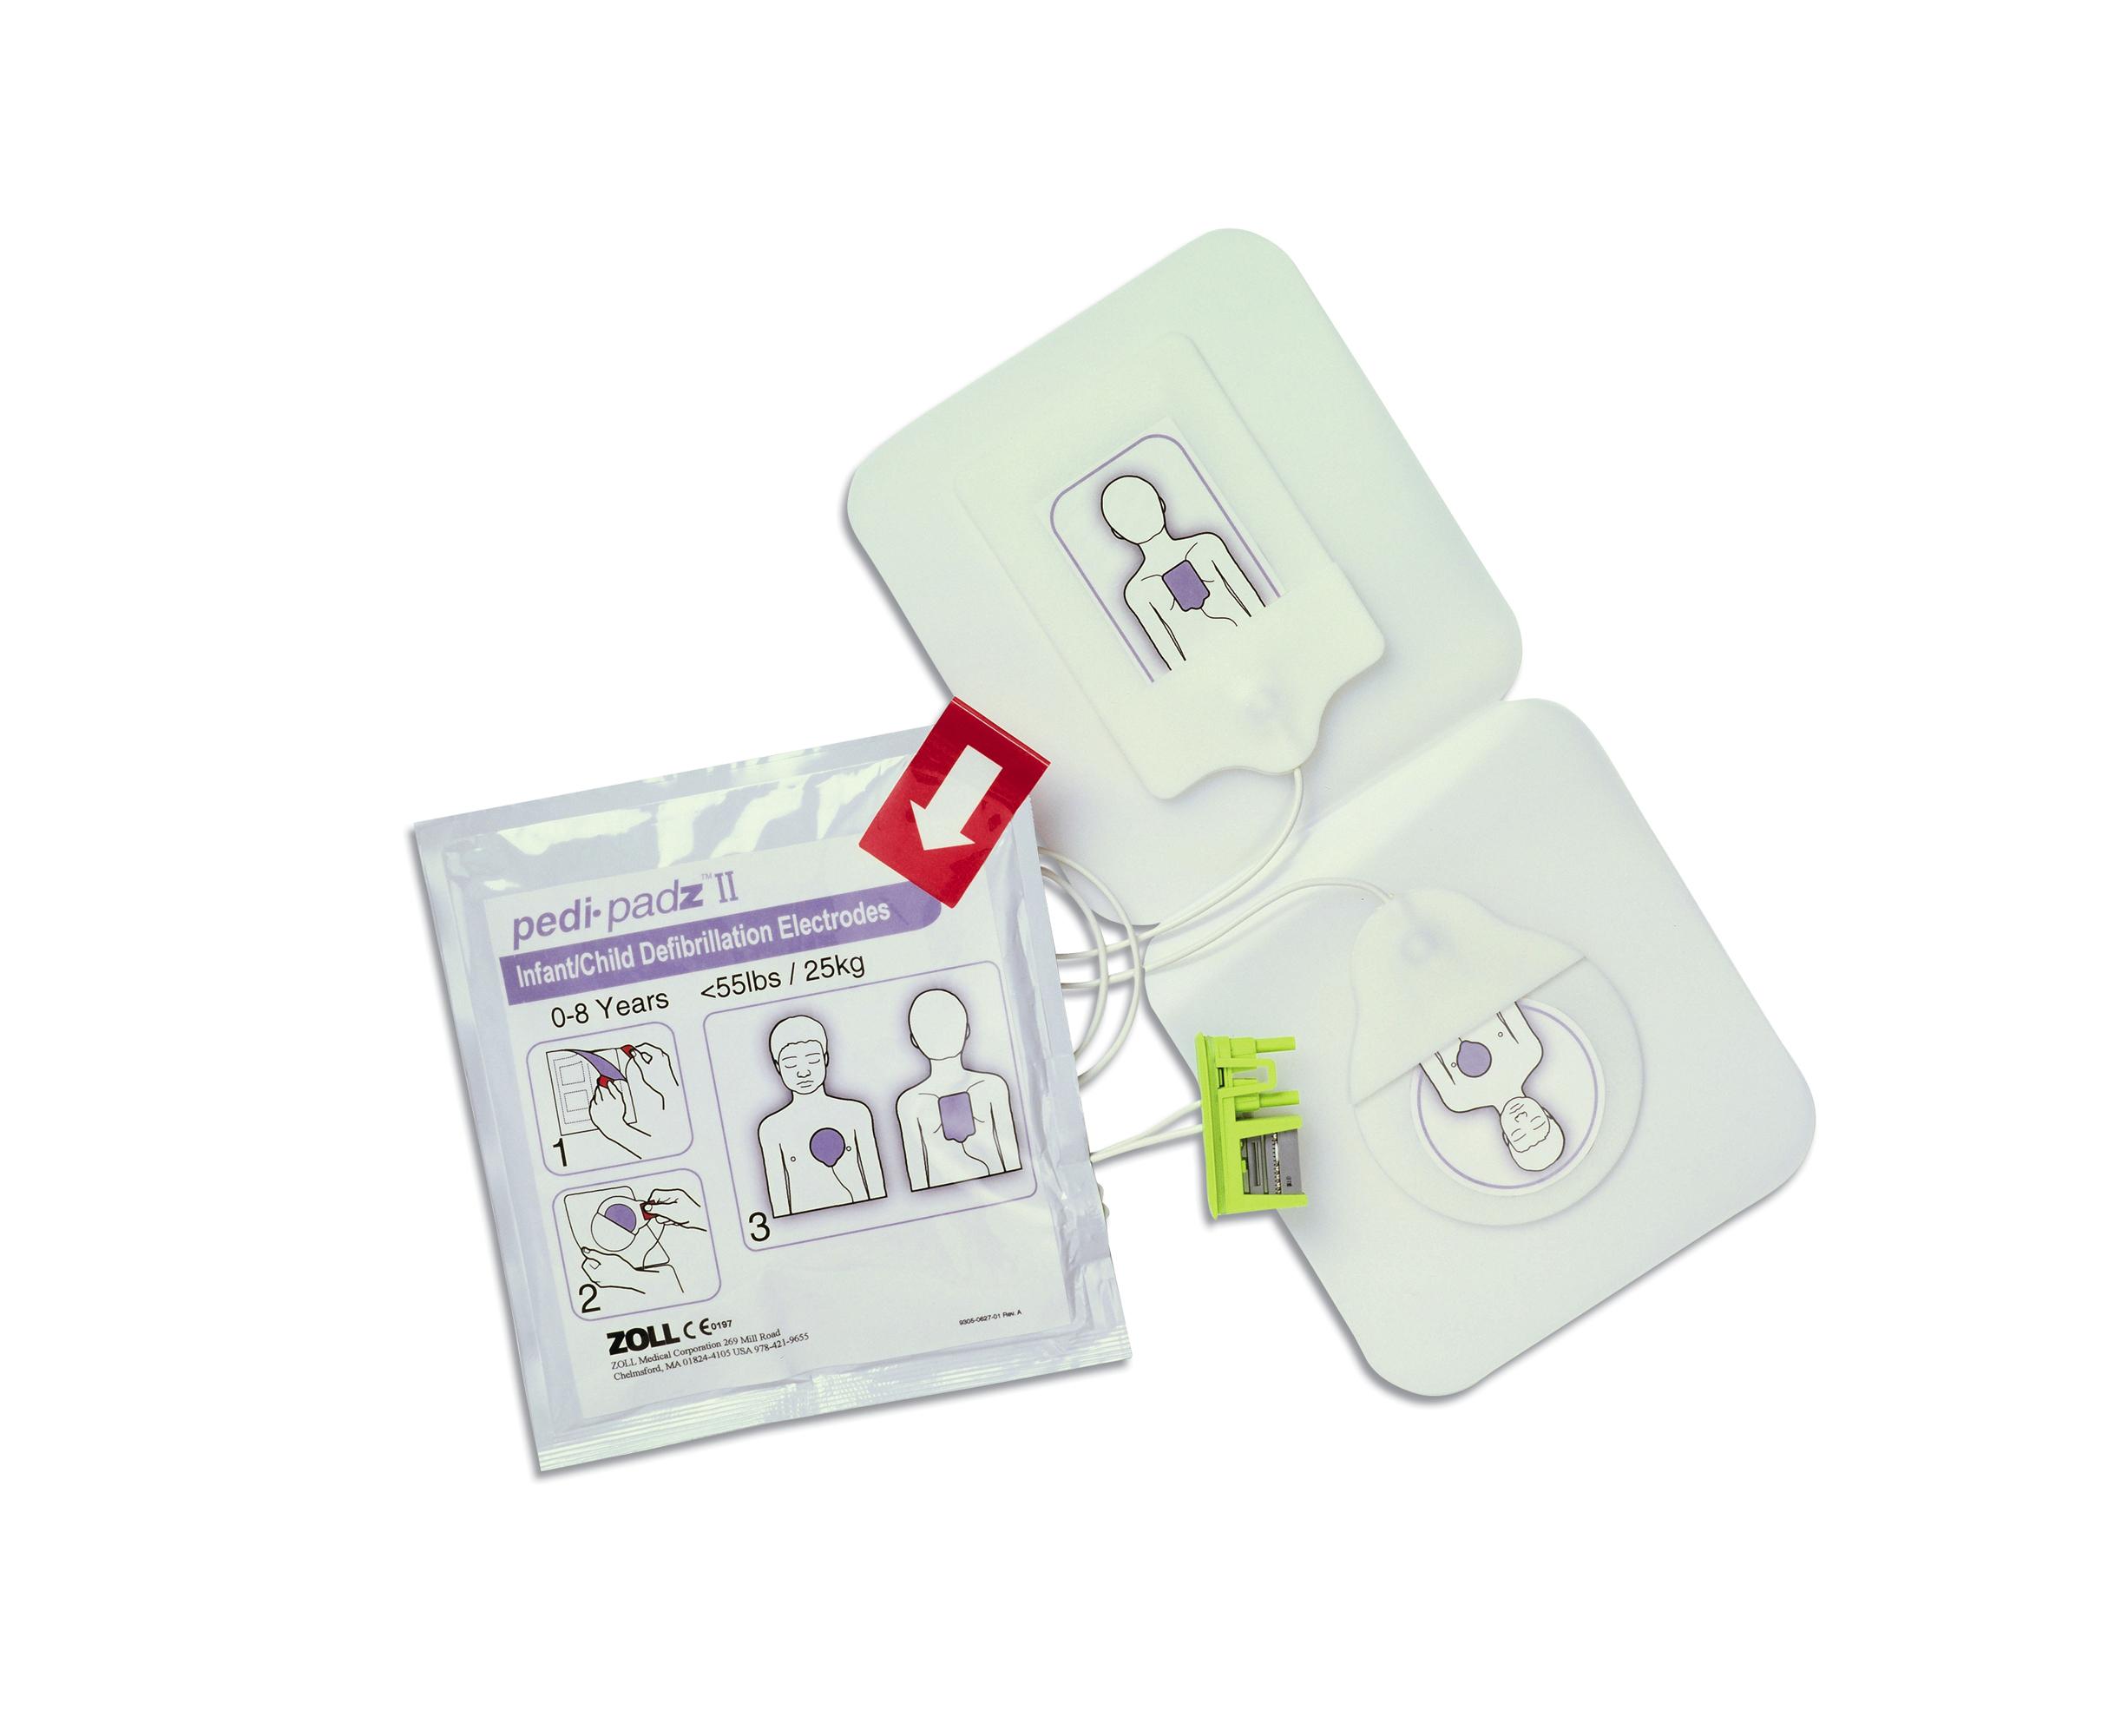 Zoll AED Plus Pedi-Pads II - Paediatric pads